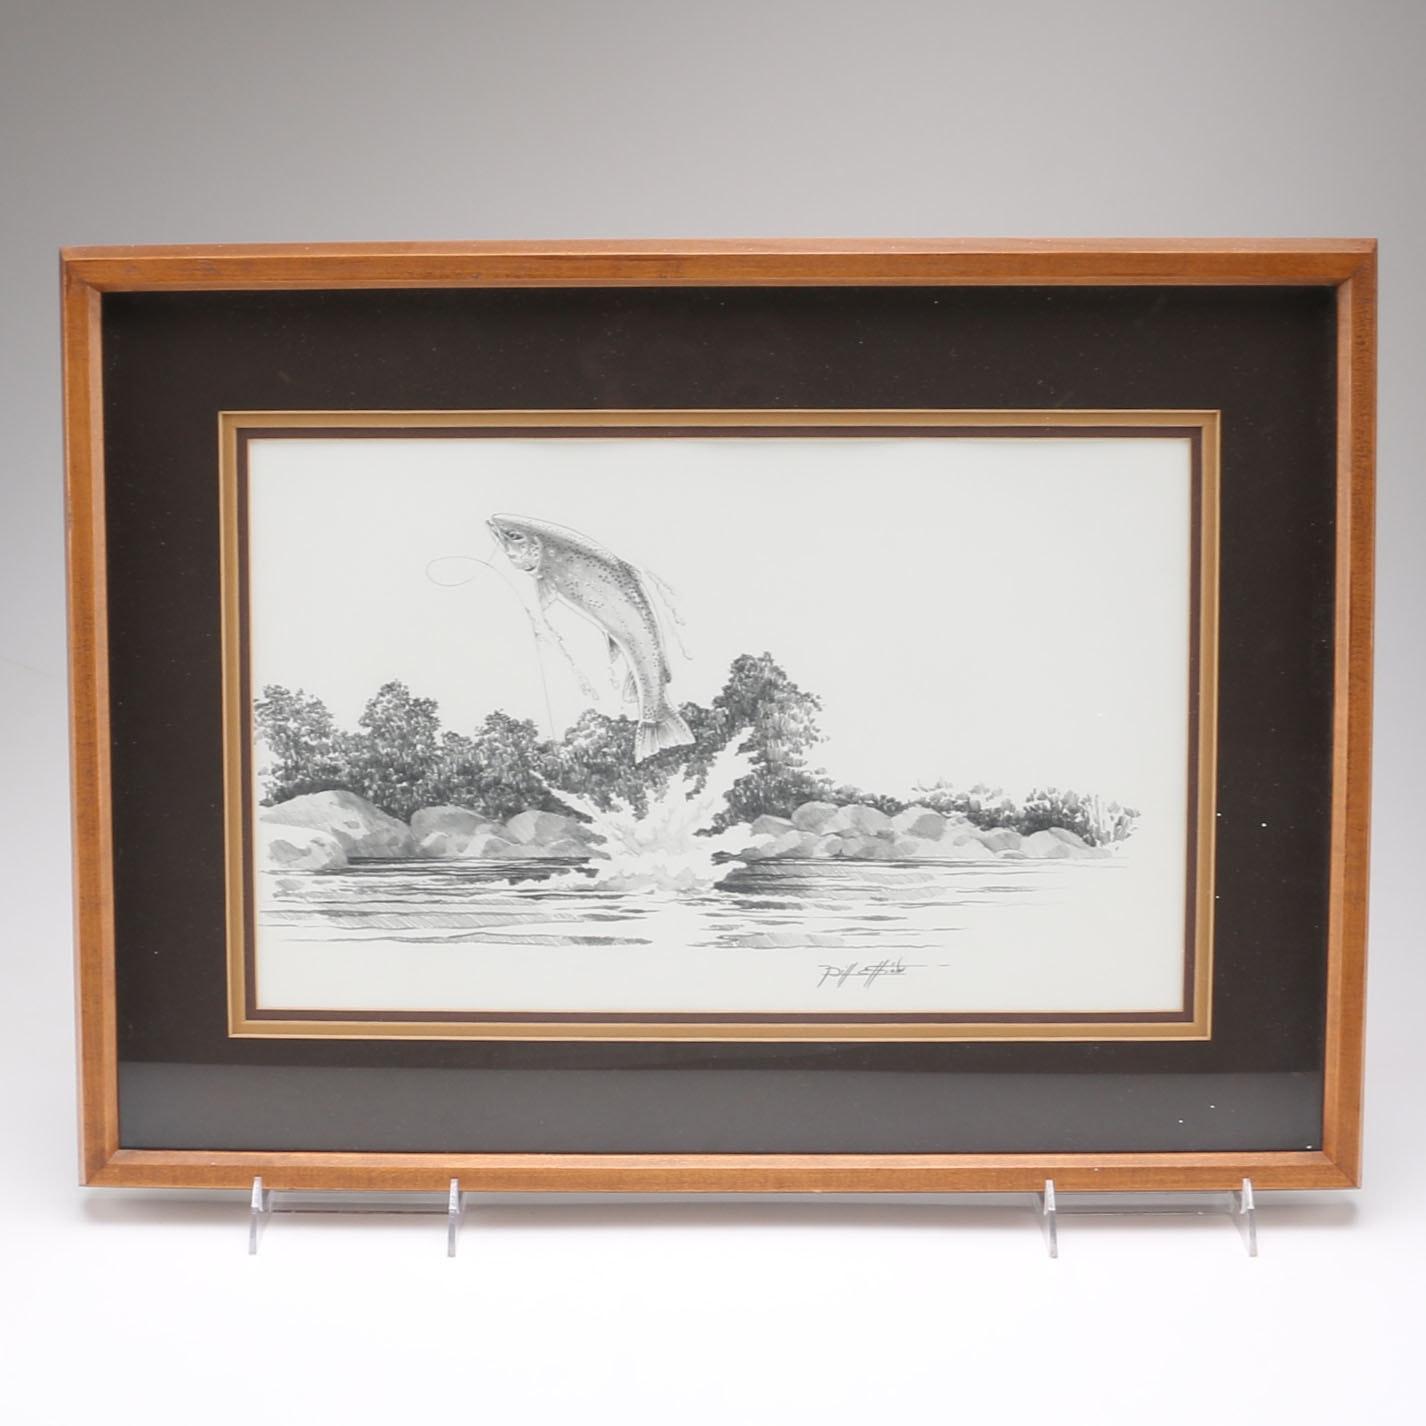 Bill Elliott Reproduction Print Fish Drawing